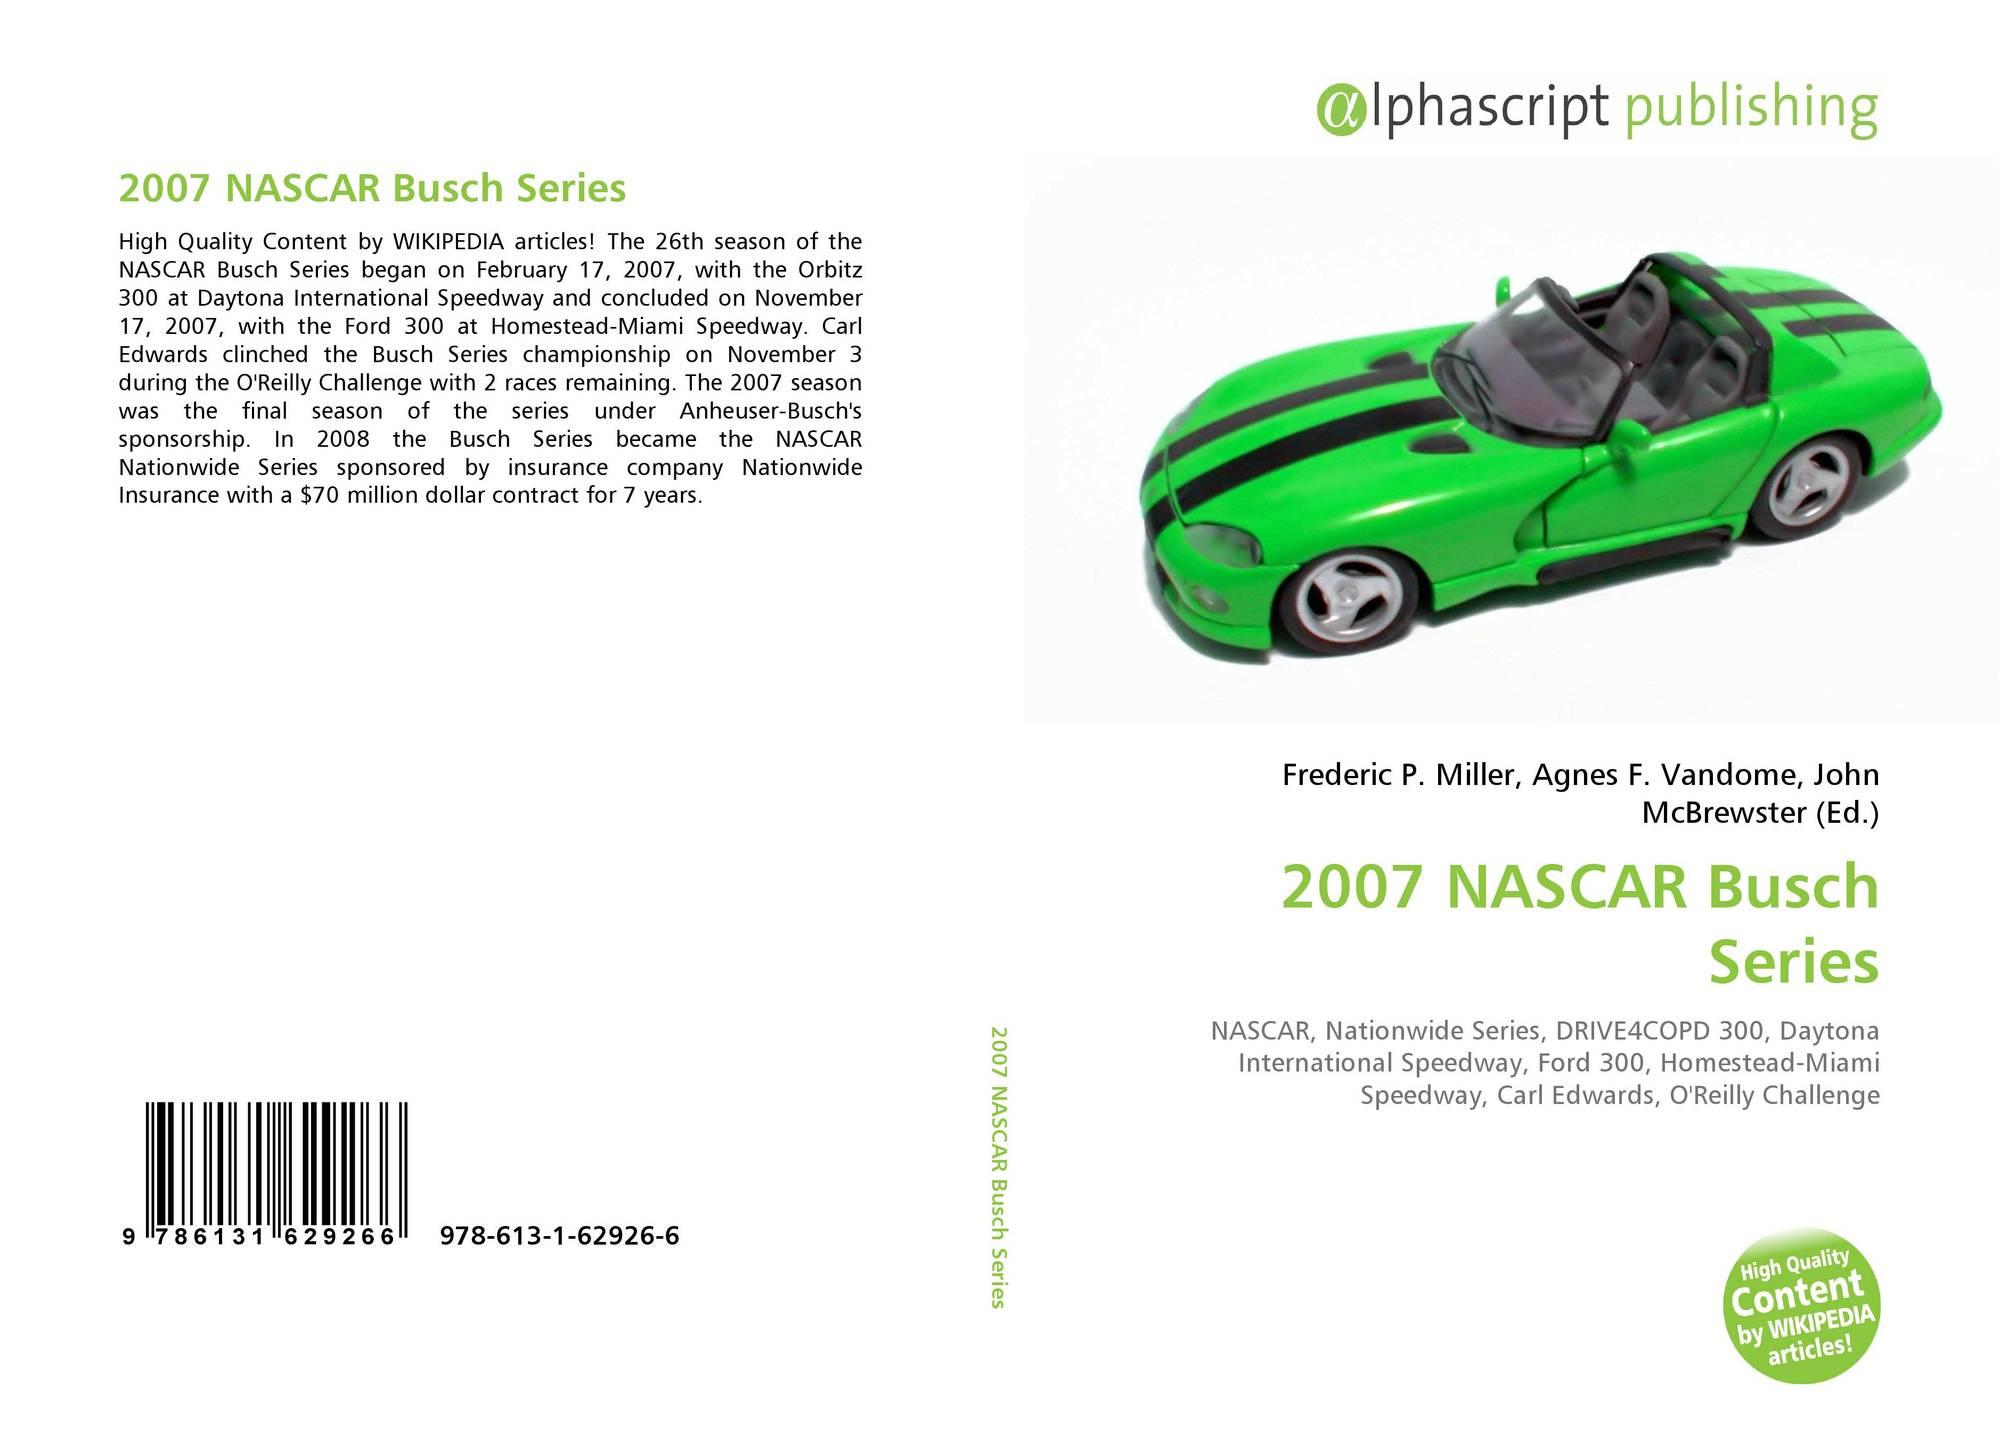 2007 NASCAR Busch Series 978 613 1 62926 6 6131629269 9786131629266